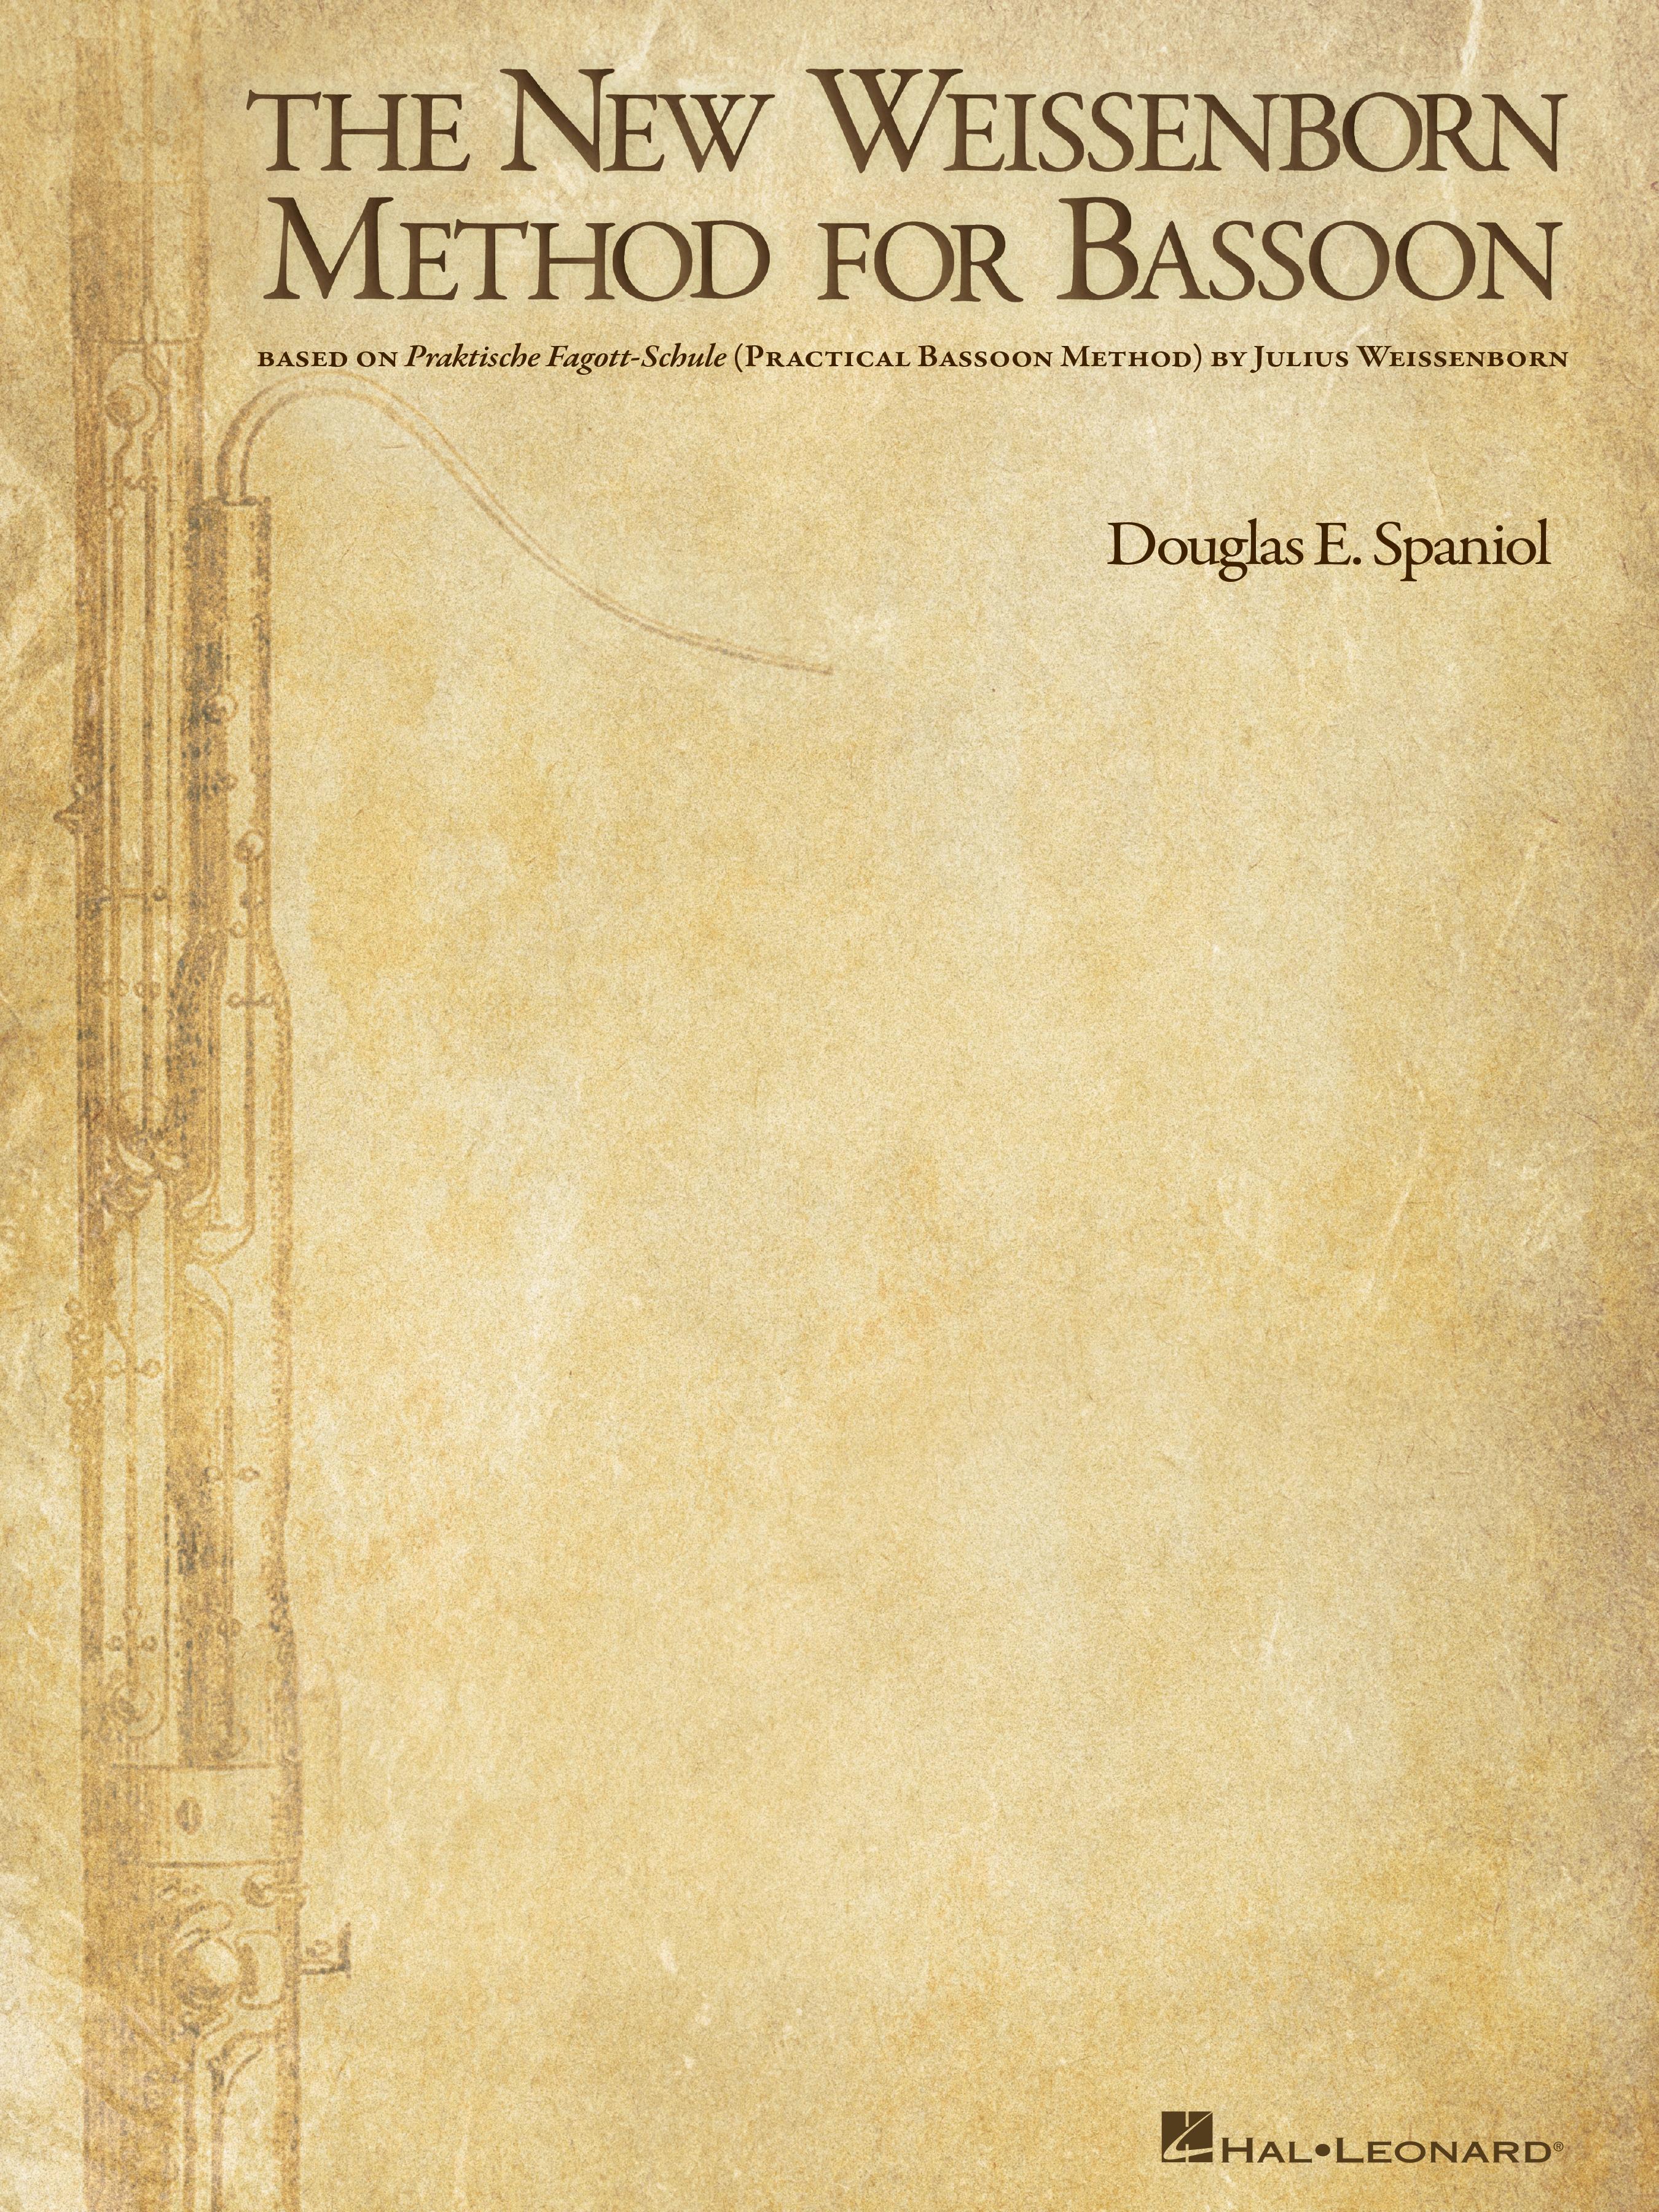 New Weissenborn Method for Bassoon